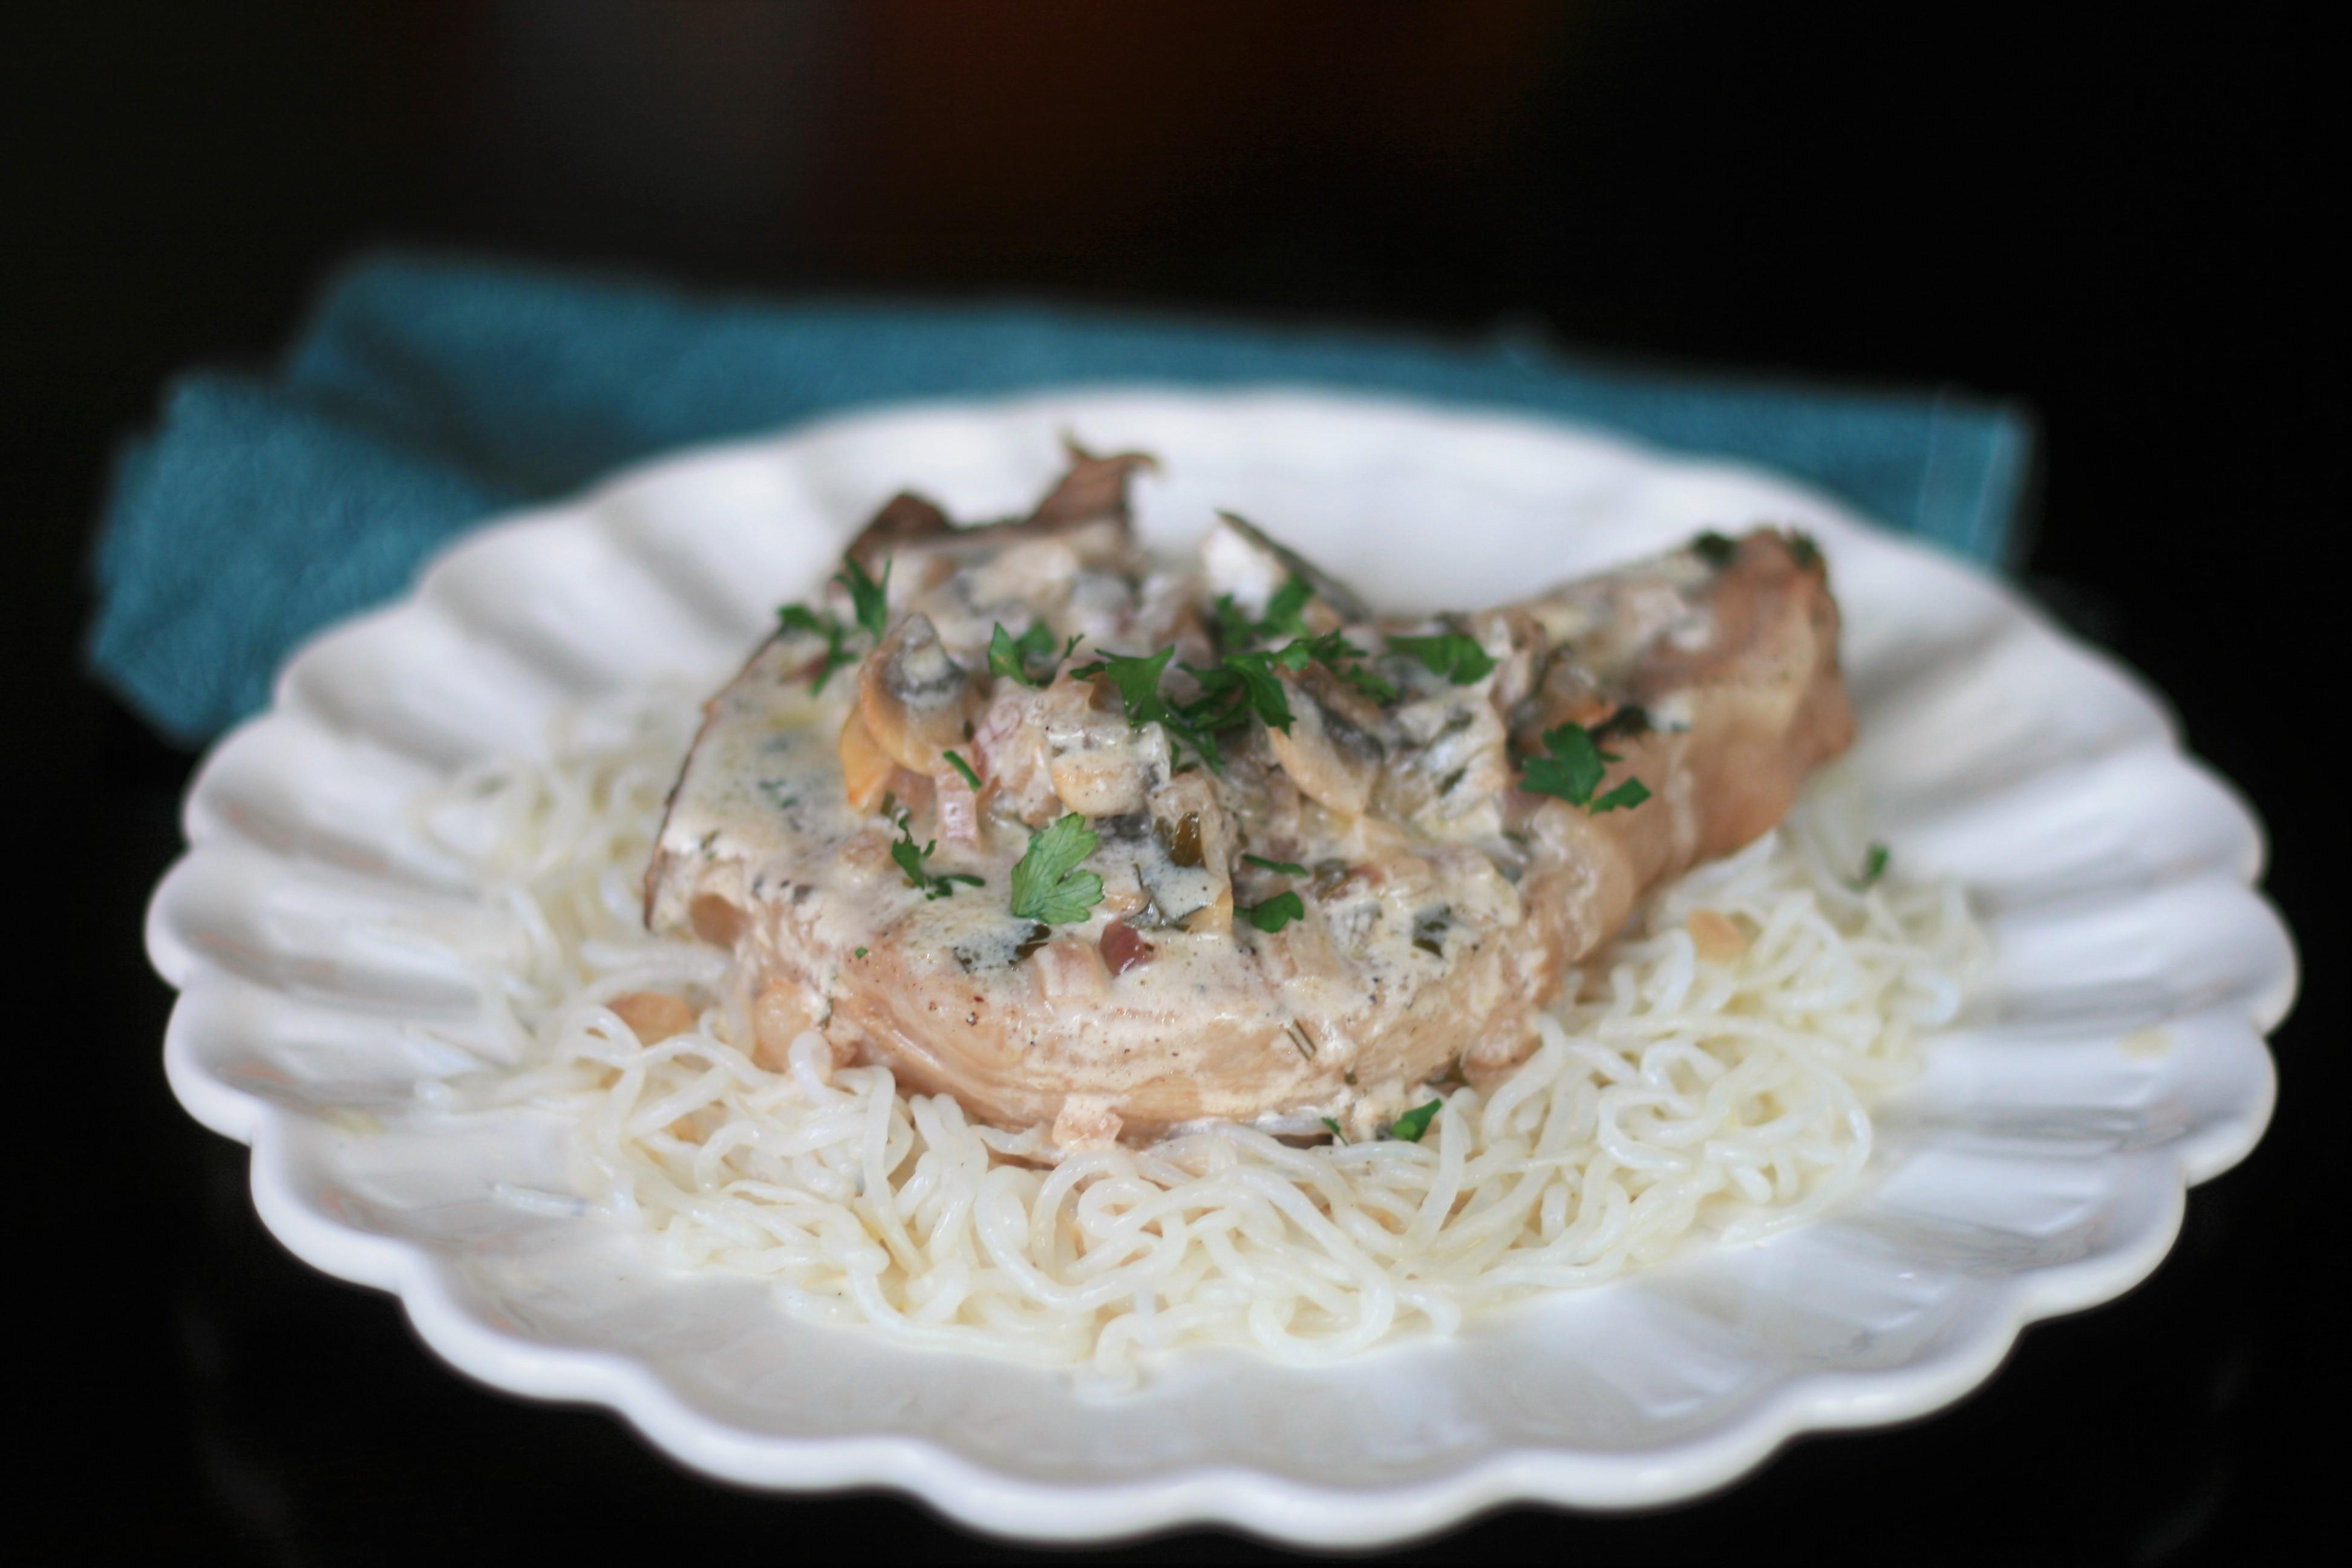 Wined and Dined Mushroom Pork Chops